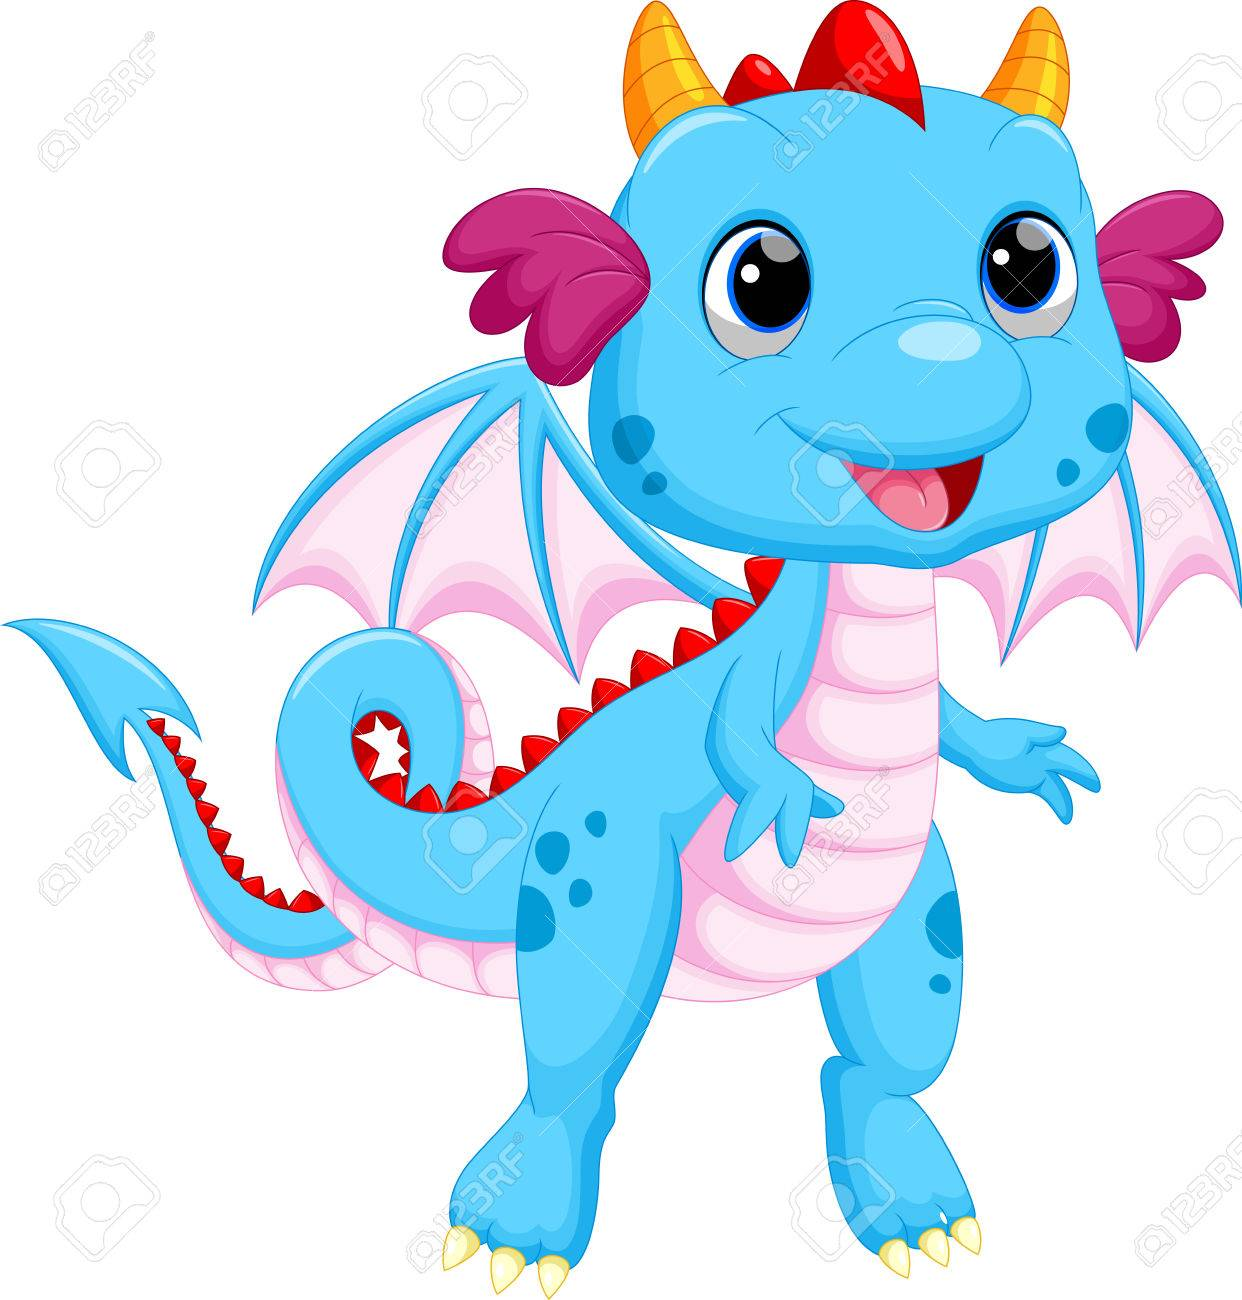 Cute baby dragon cartoon - 44958677